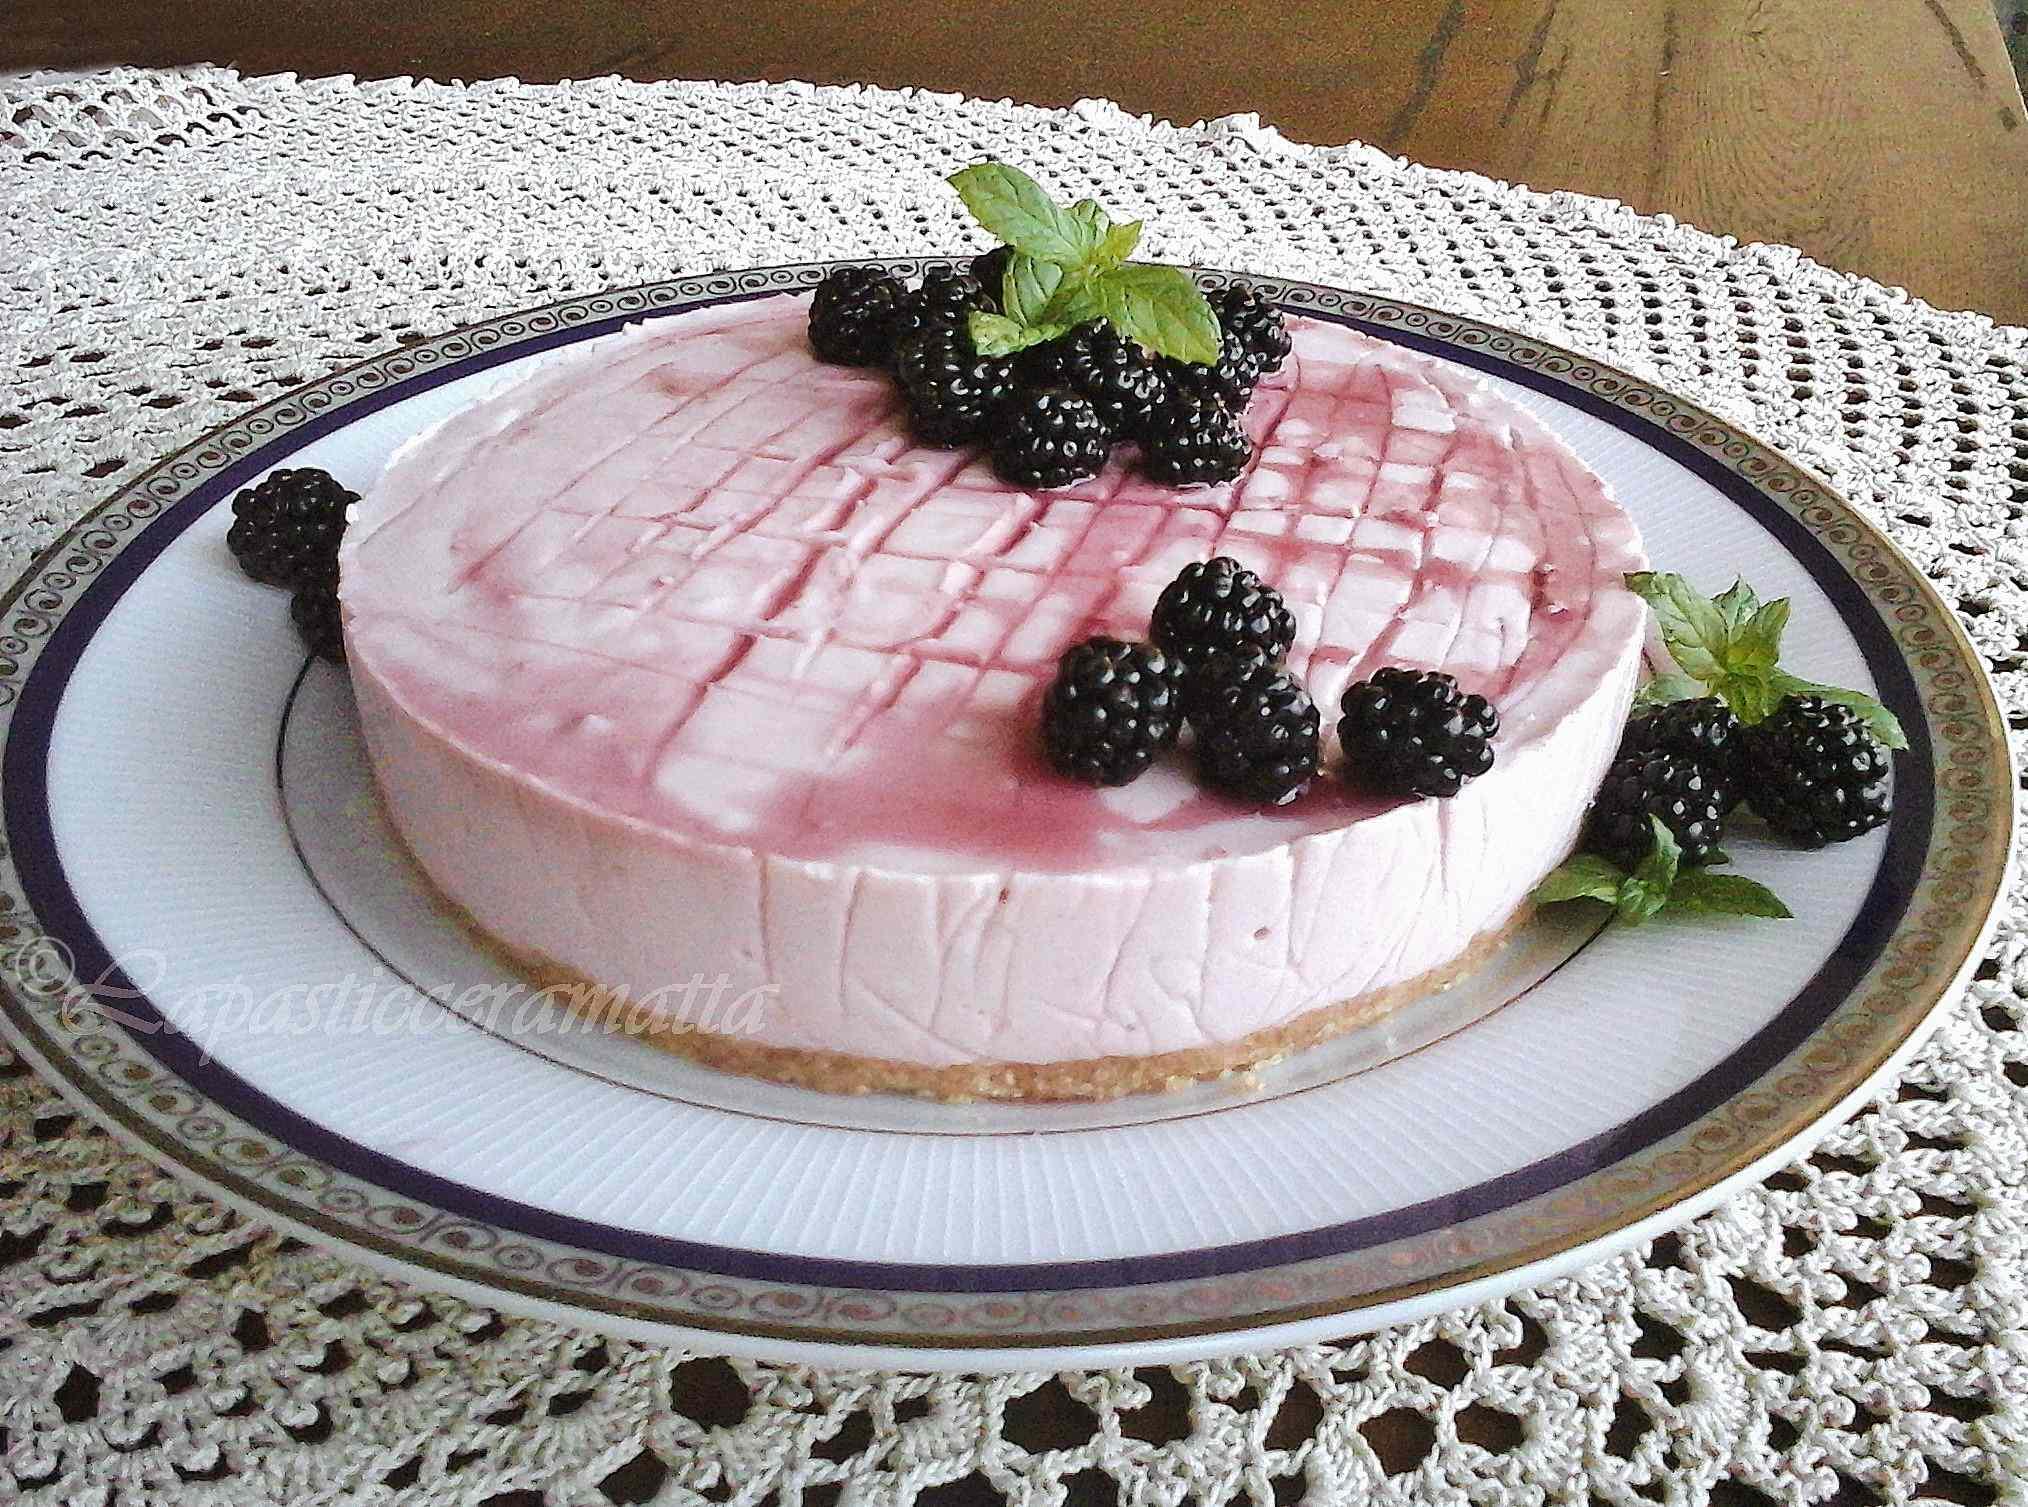 Ricetta: Cheese cake alle more senza cottura